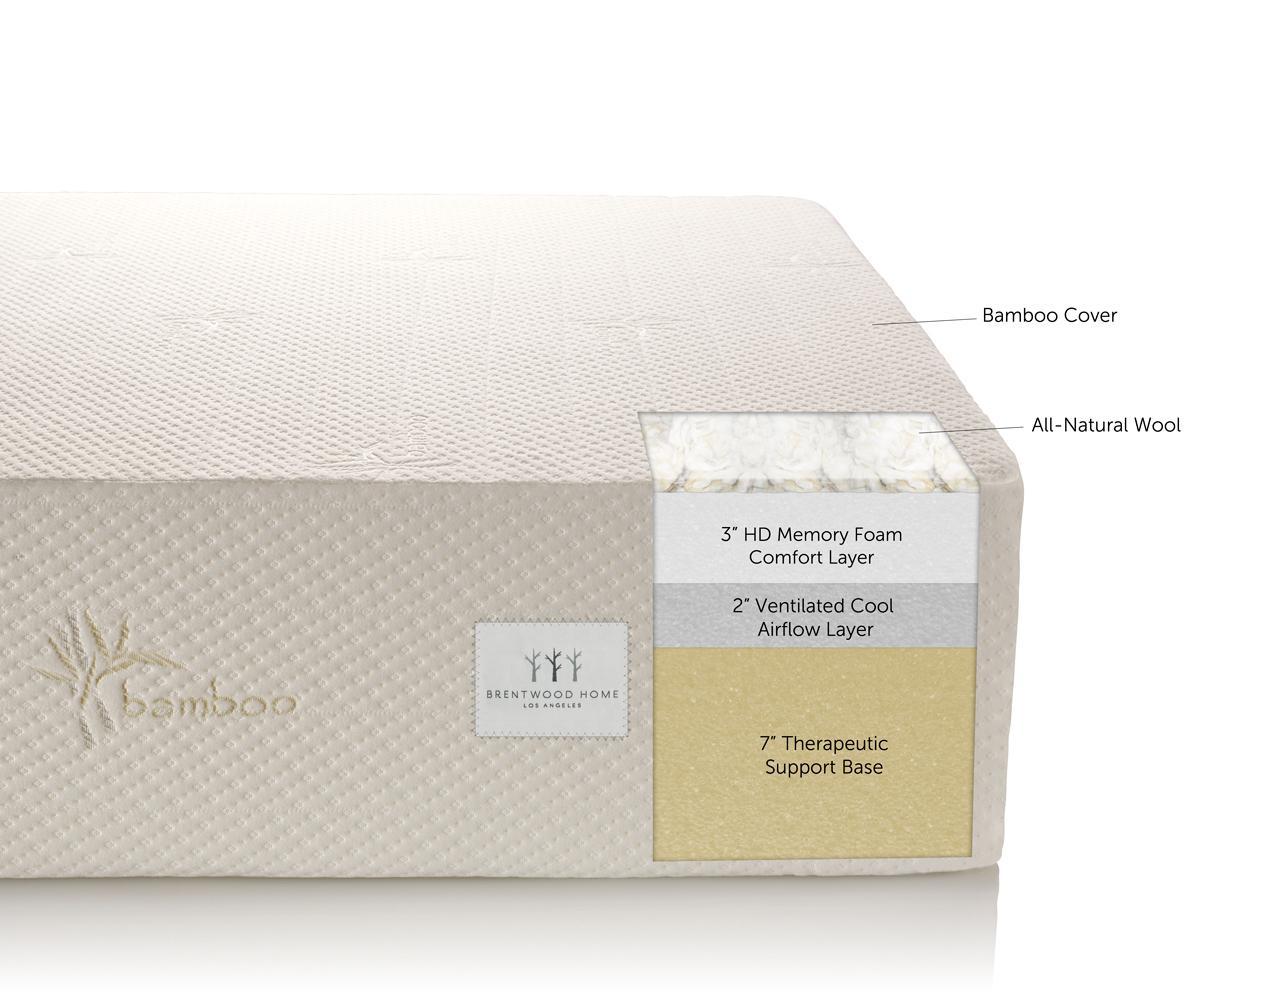 "Amazon Brentwood 12"" HD Memory Foam Mattress 100%"